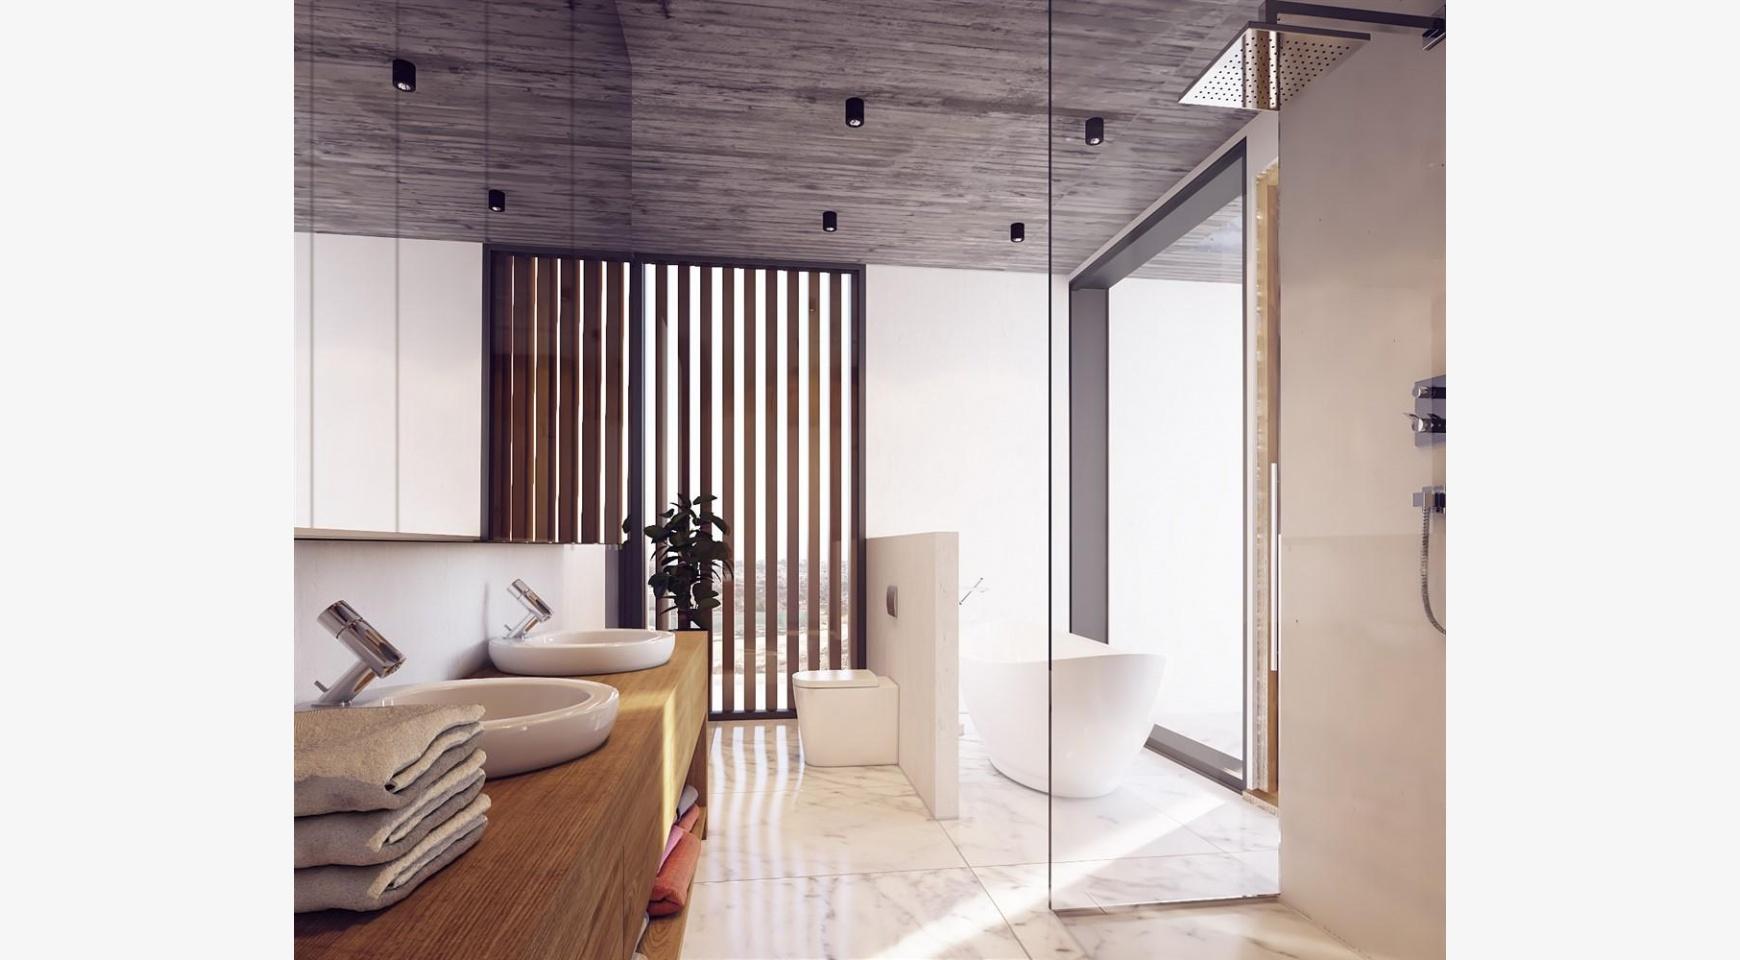 Exclusive 3 Bedroom Villa with Stunning Views in Germasogeia - 8